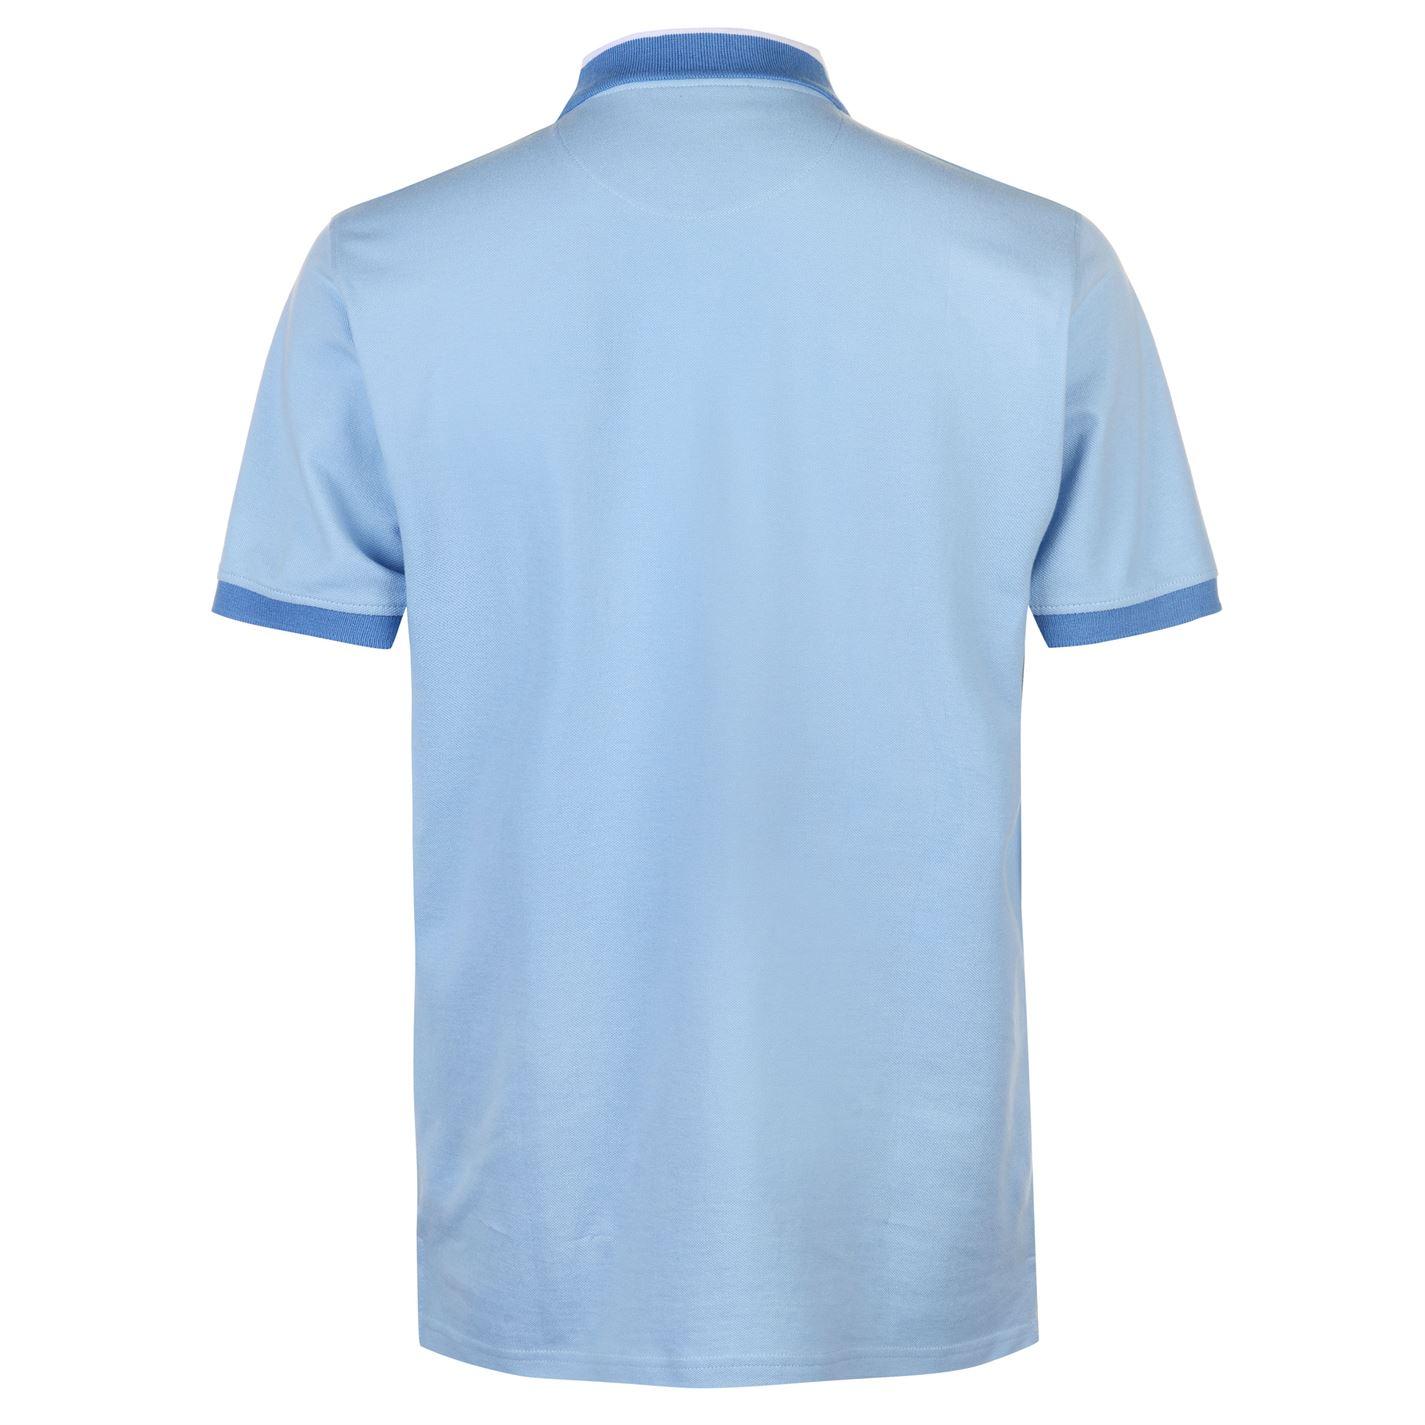 Pierre Cardin Mens Pique Polo Shirt Classic Fit Tee Top Short Sleeve Cotton